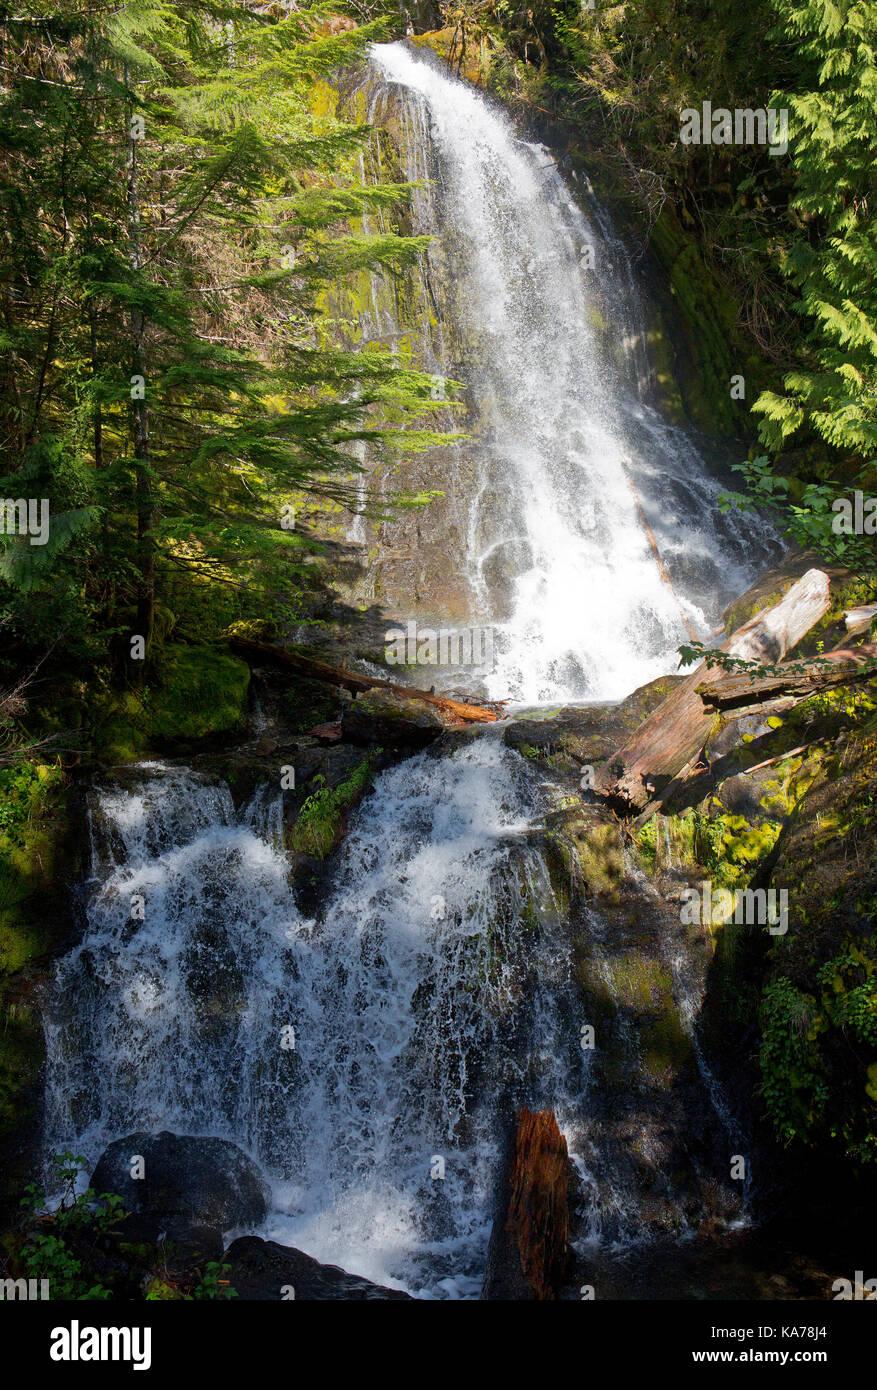 Falls Creek, a  waterfall in Mount Rainier national park, Washington State, USA - Stock Image